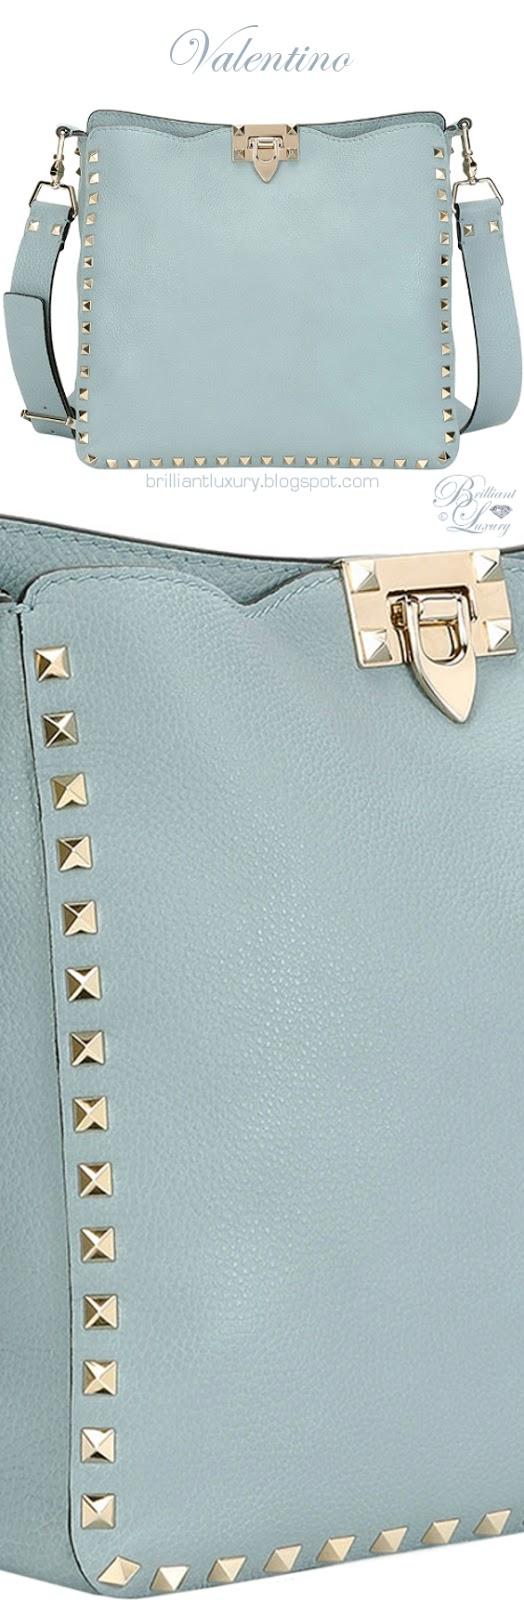 Brilliant Luxury ♦ Valentino Garavani Rockstud small blue leather hobo bag